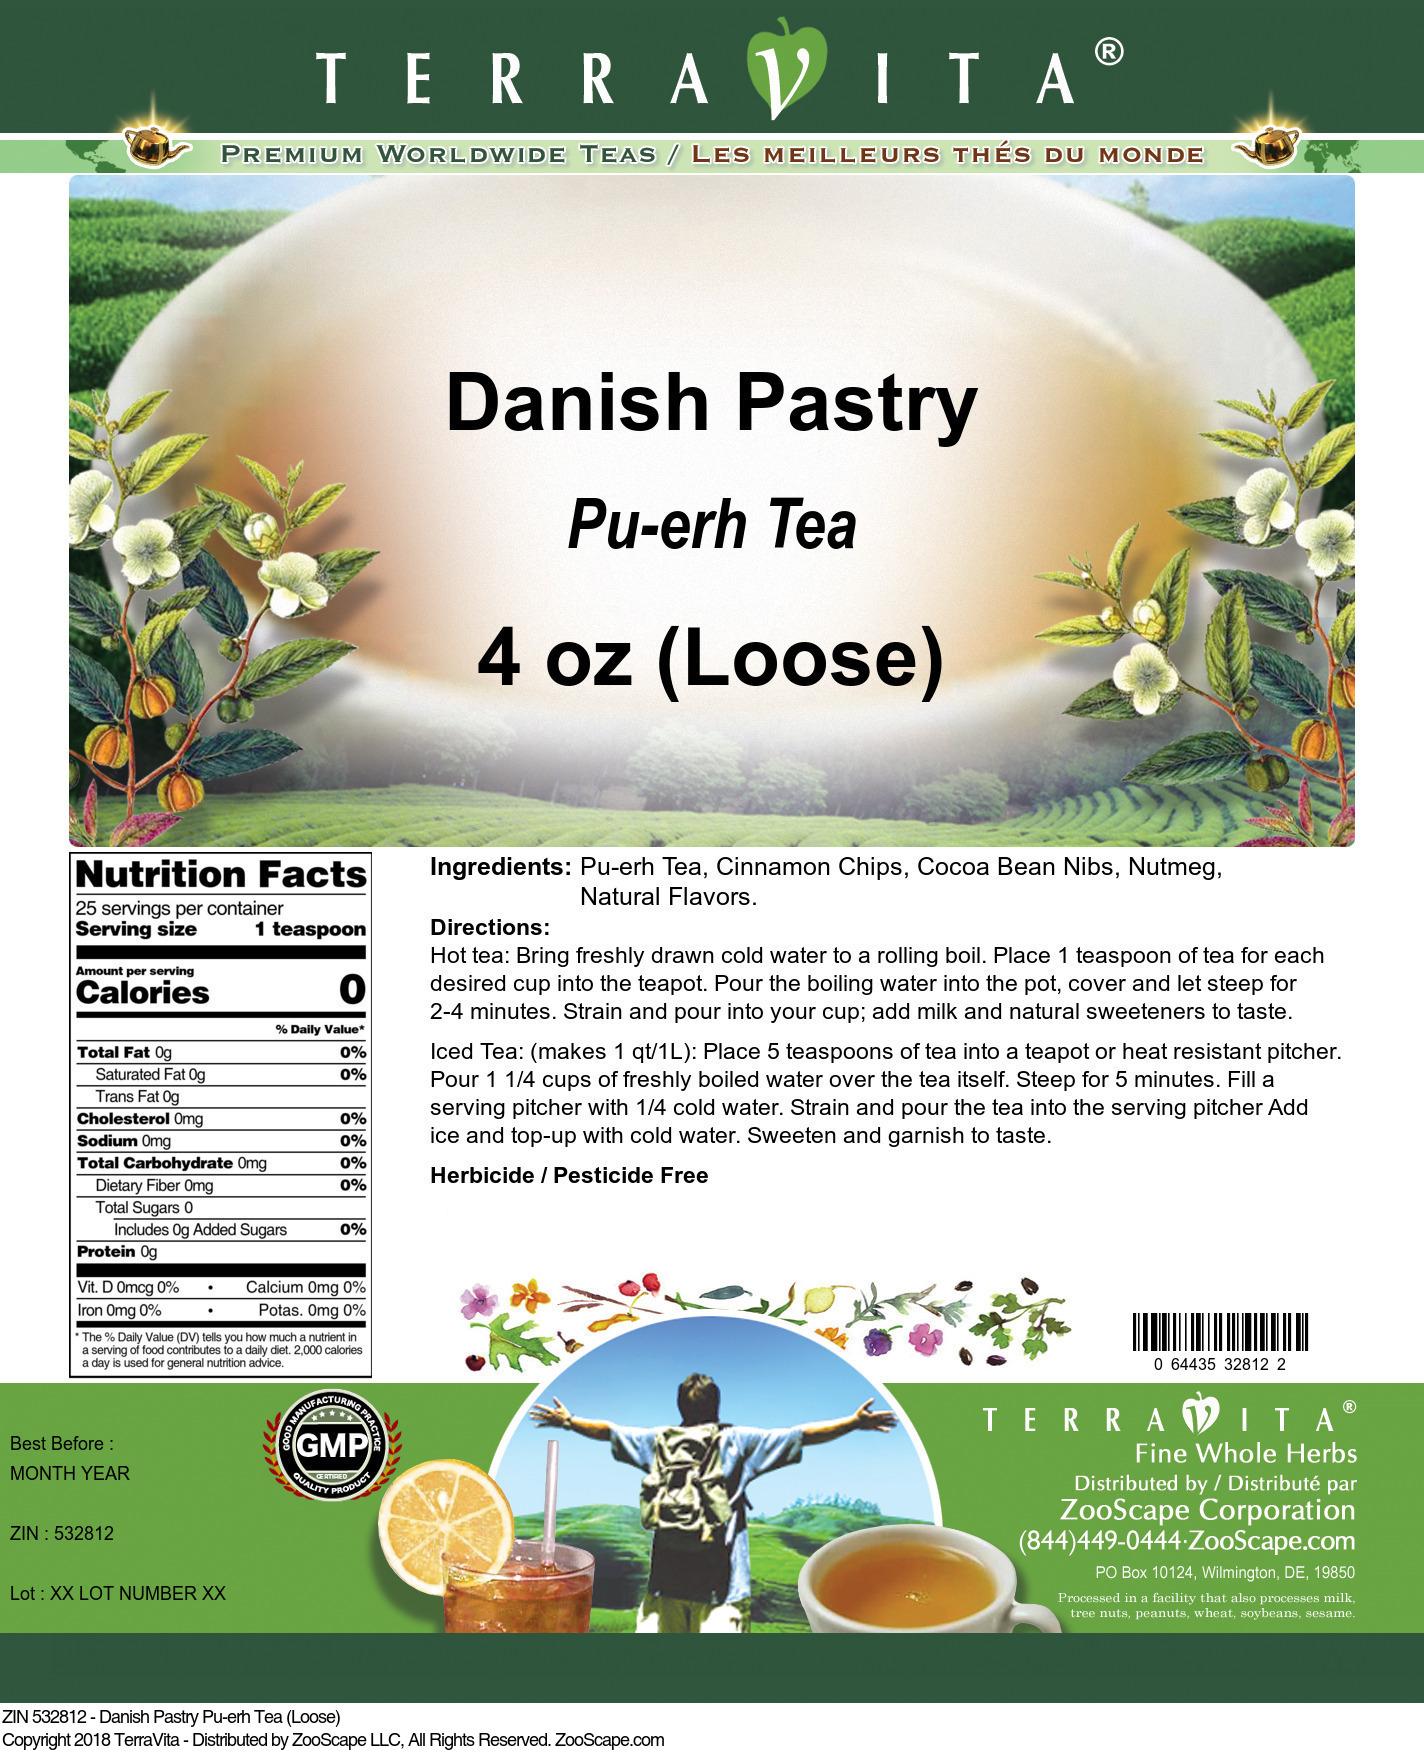 Danish Pastry Pu-erh Tea (Loose)